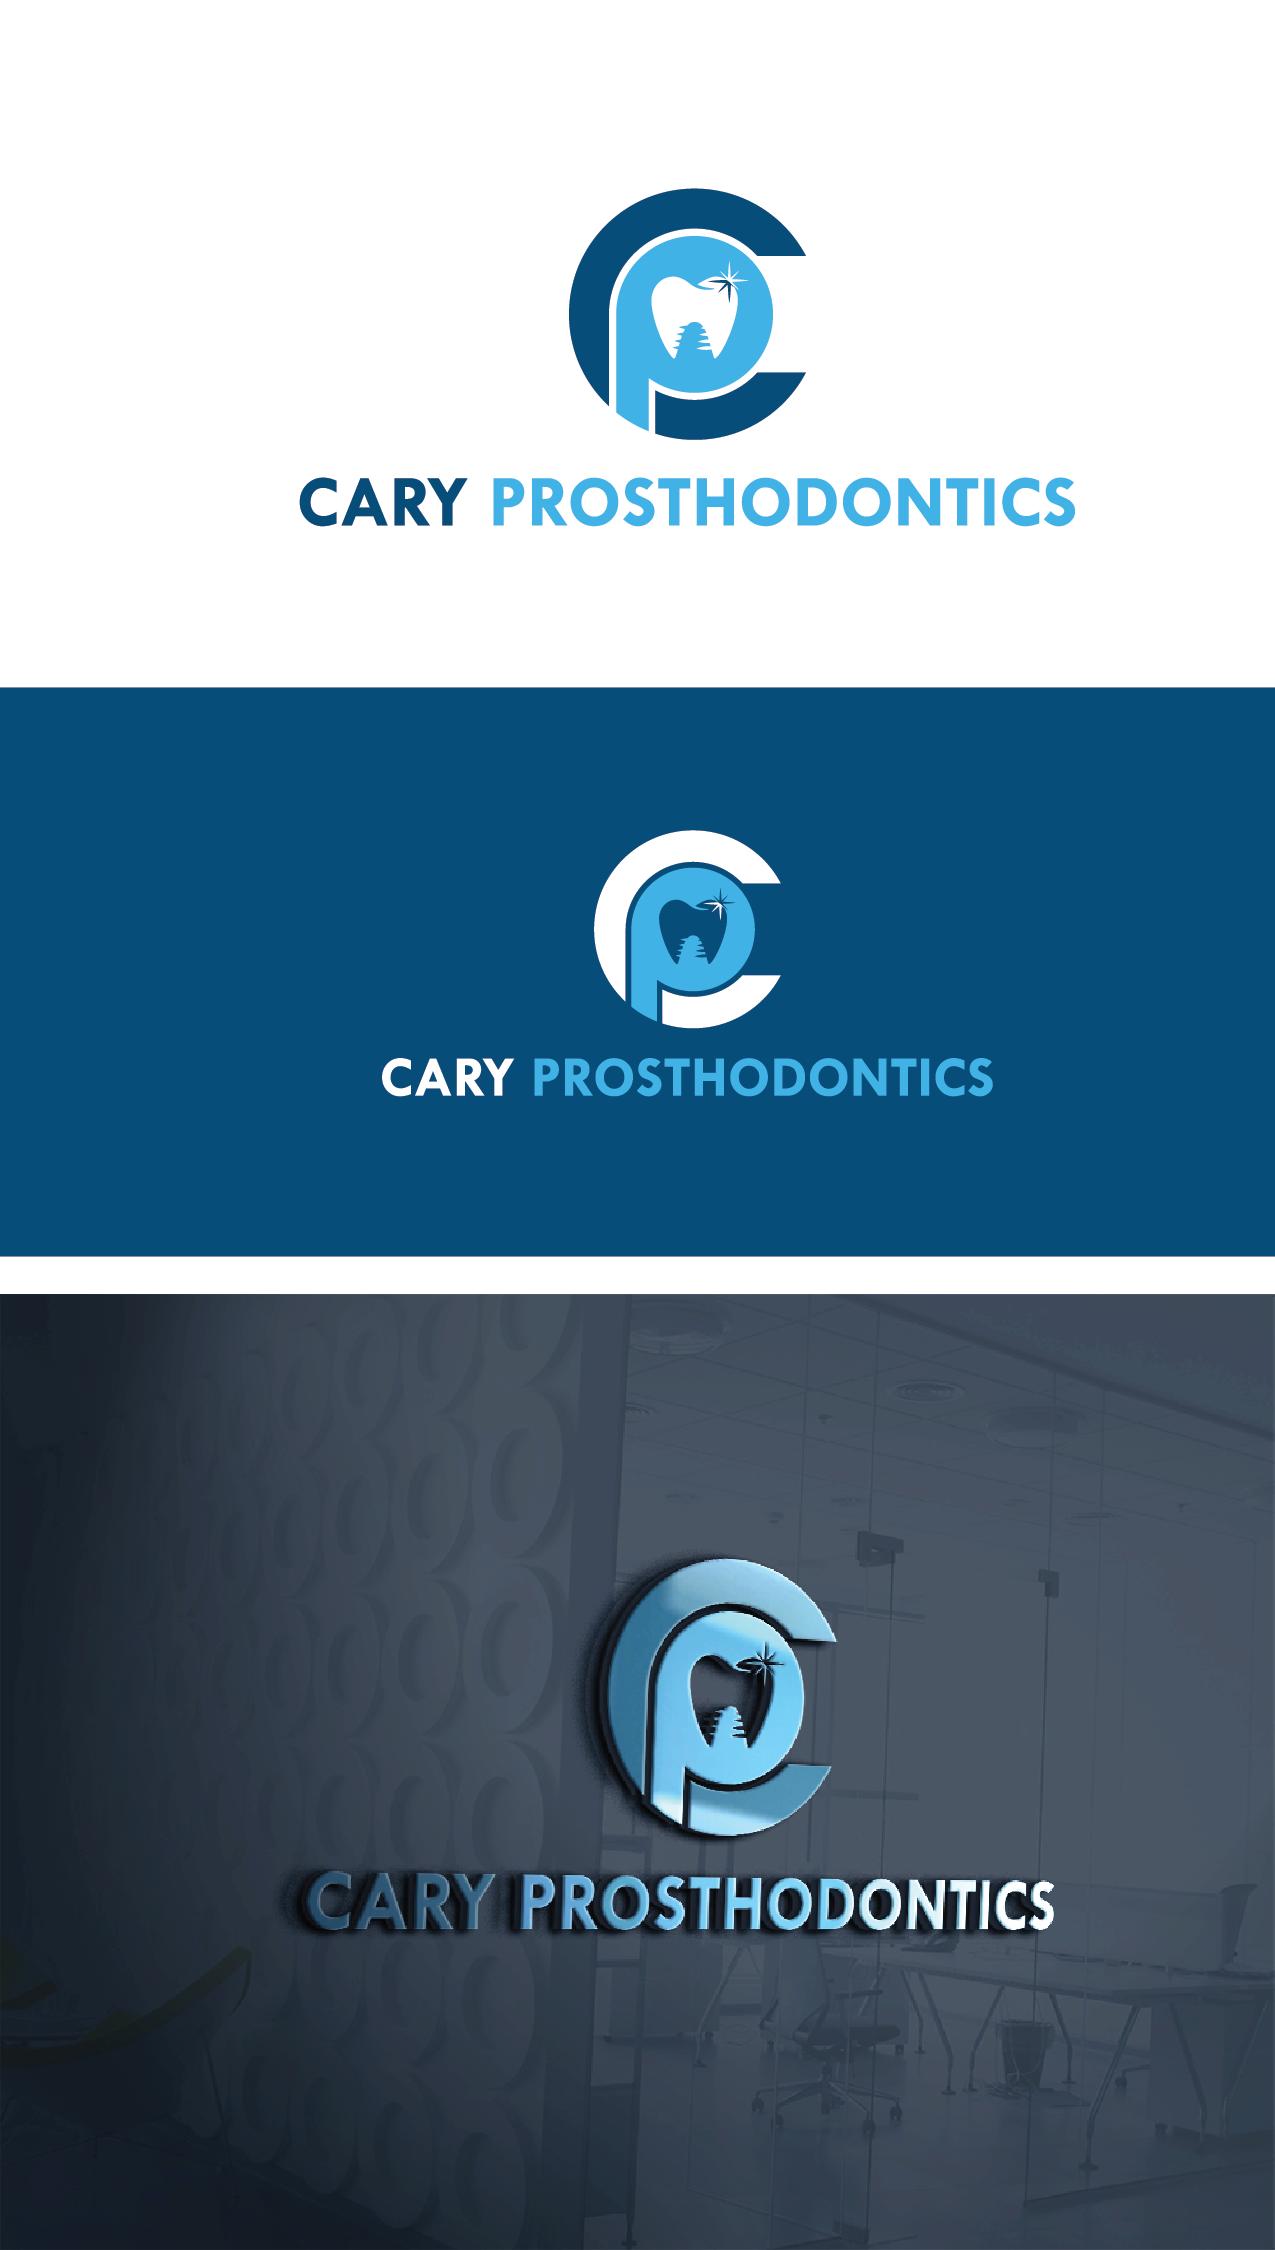 Logo Design by Private User - Entry No. 14 in the Logo Design Contest Cary Prosthodontics Logo Design.